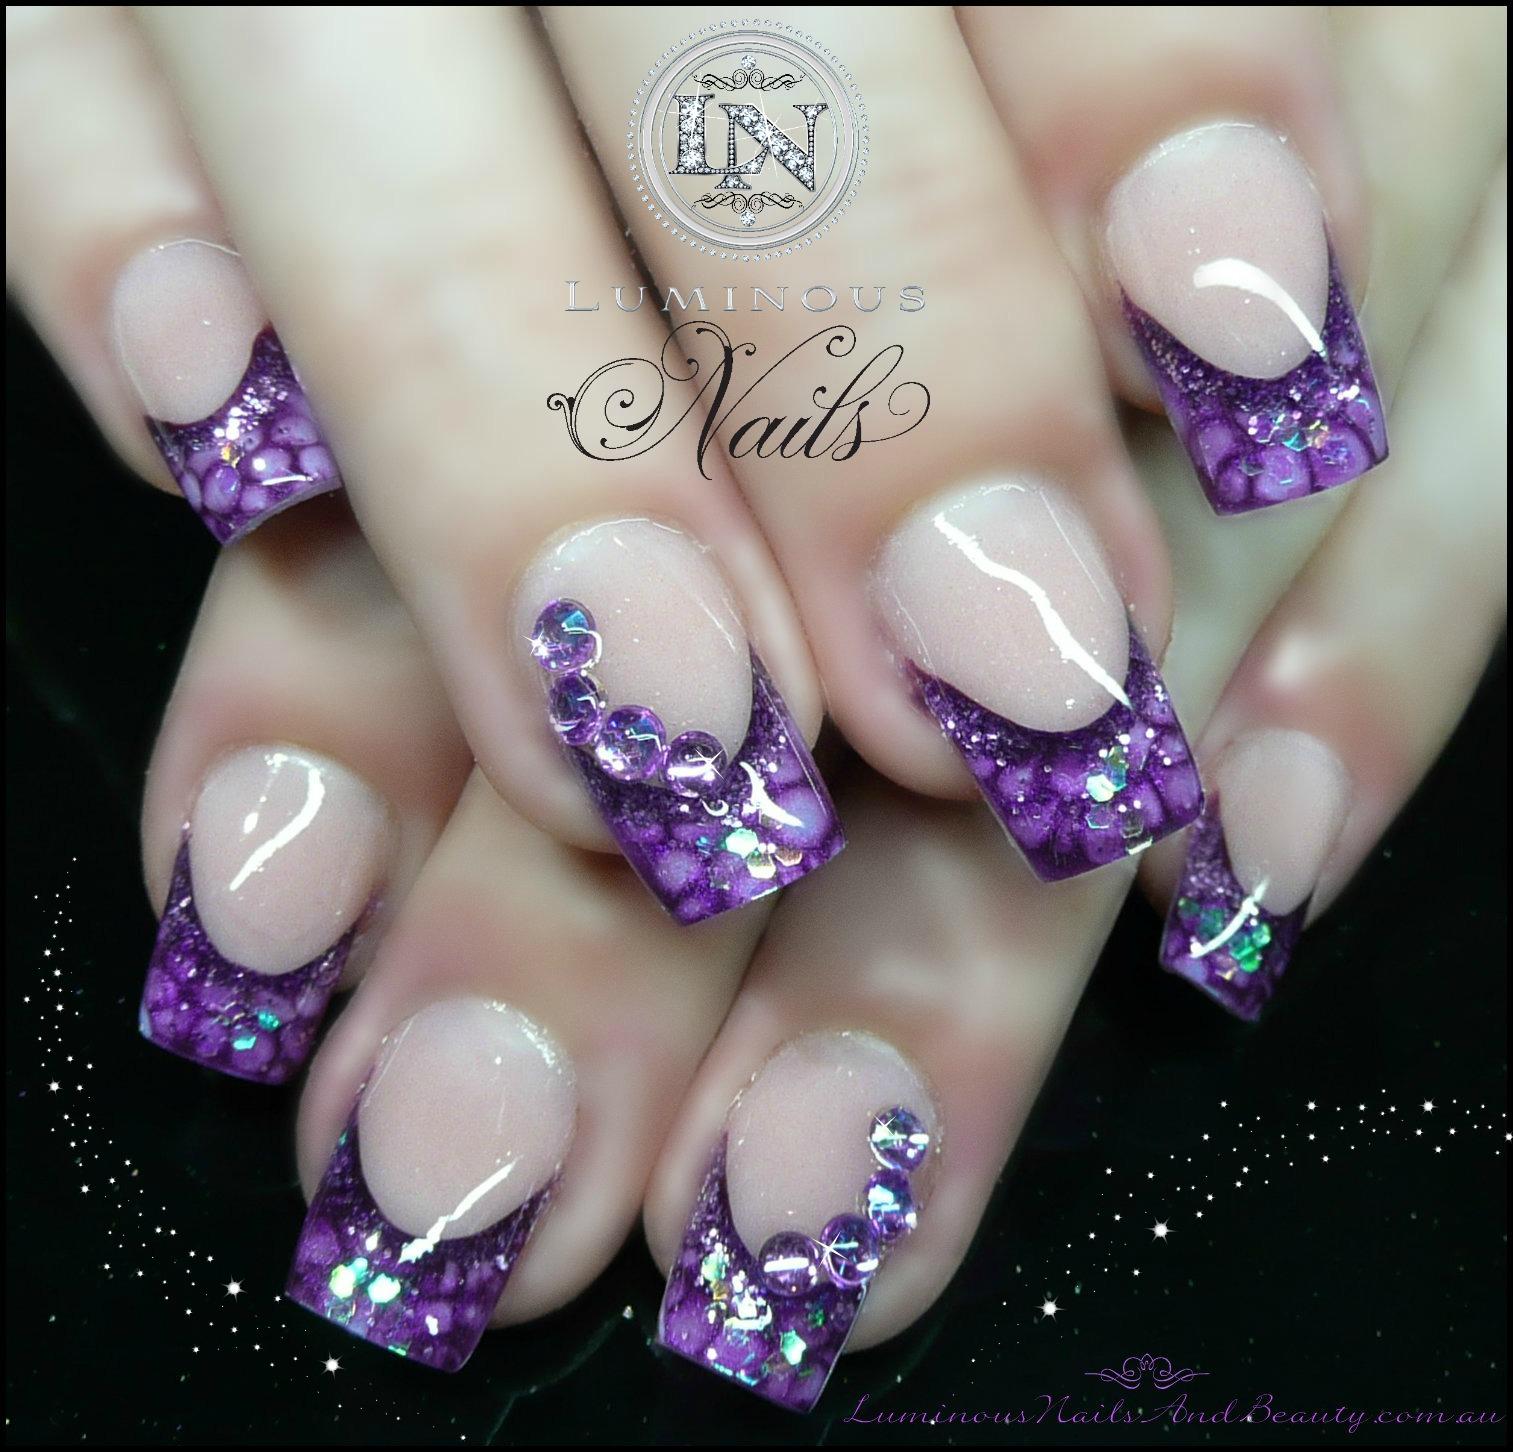 Acrylic Nail Designs Lavender: Mind blowing acrylic nail art ideas ...